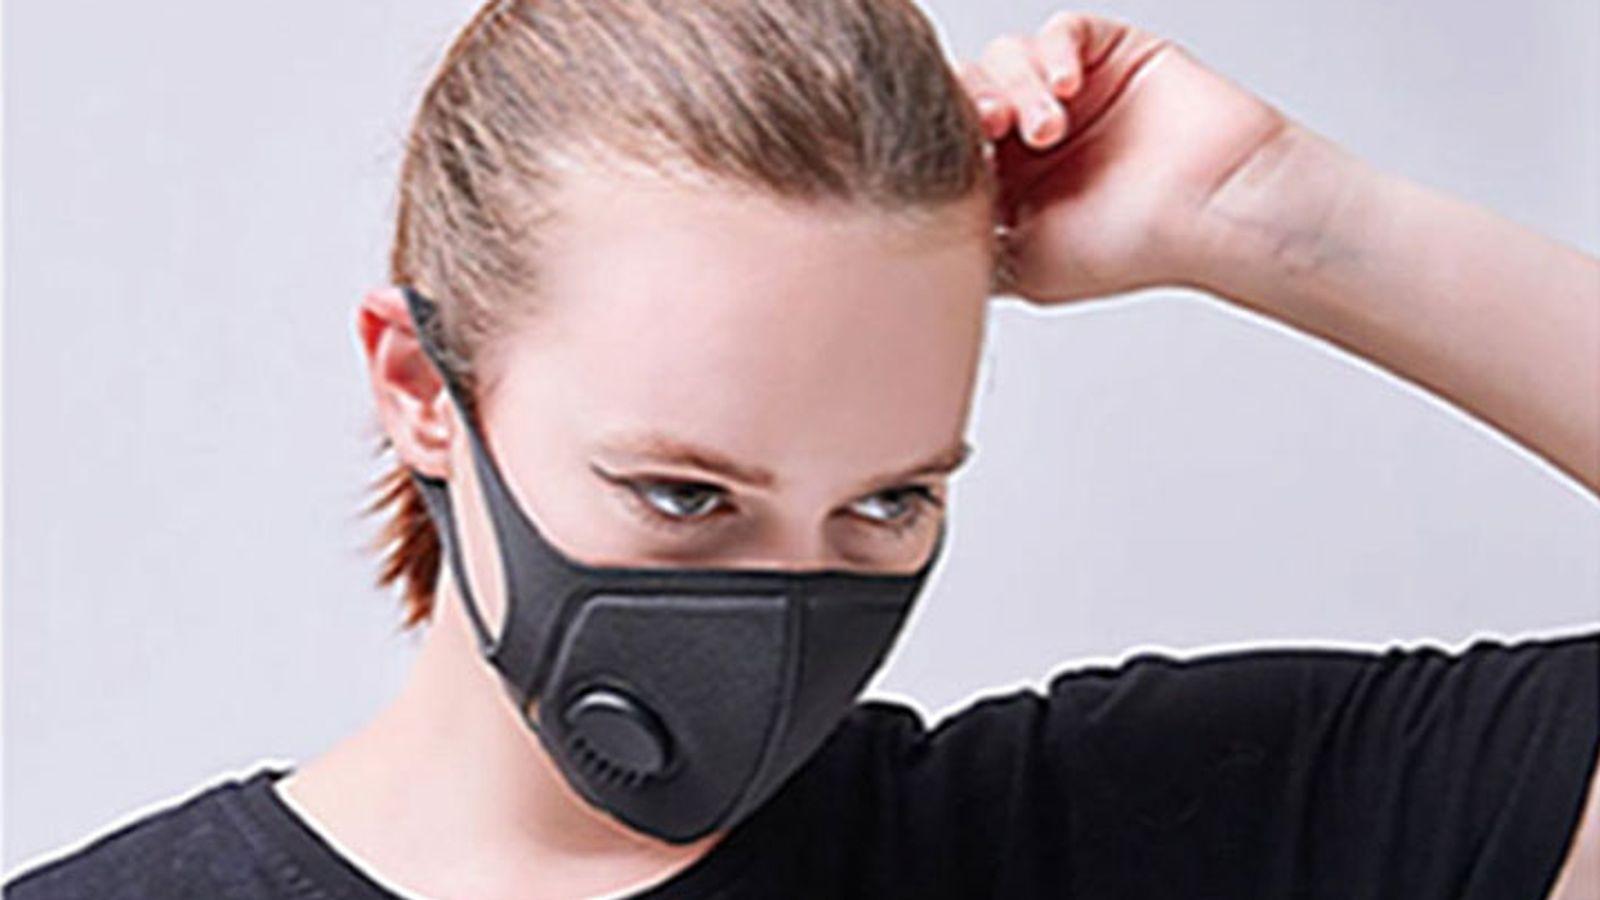 Coronavirus Scaremongering Adverts For Face Masks Banned Uk